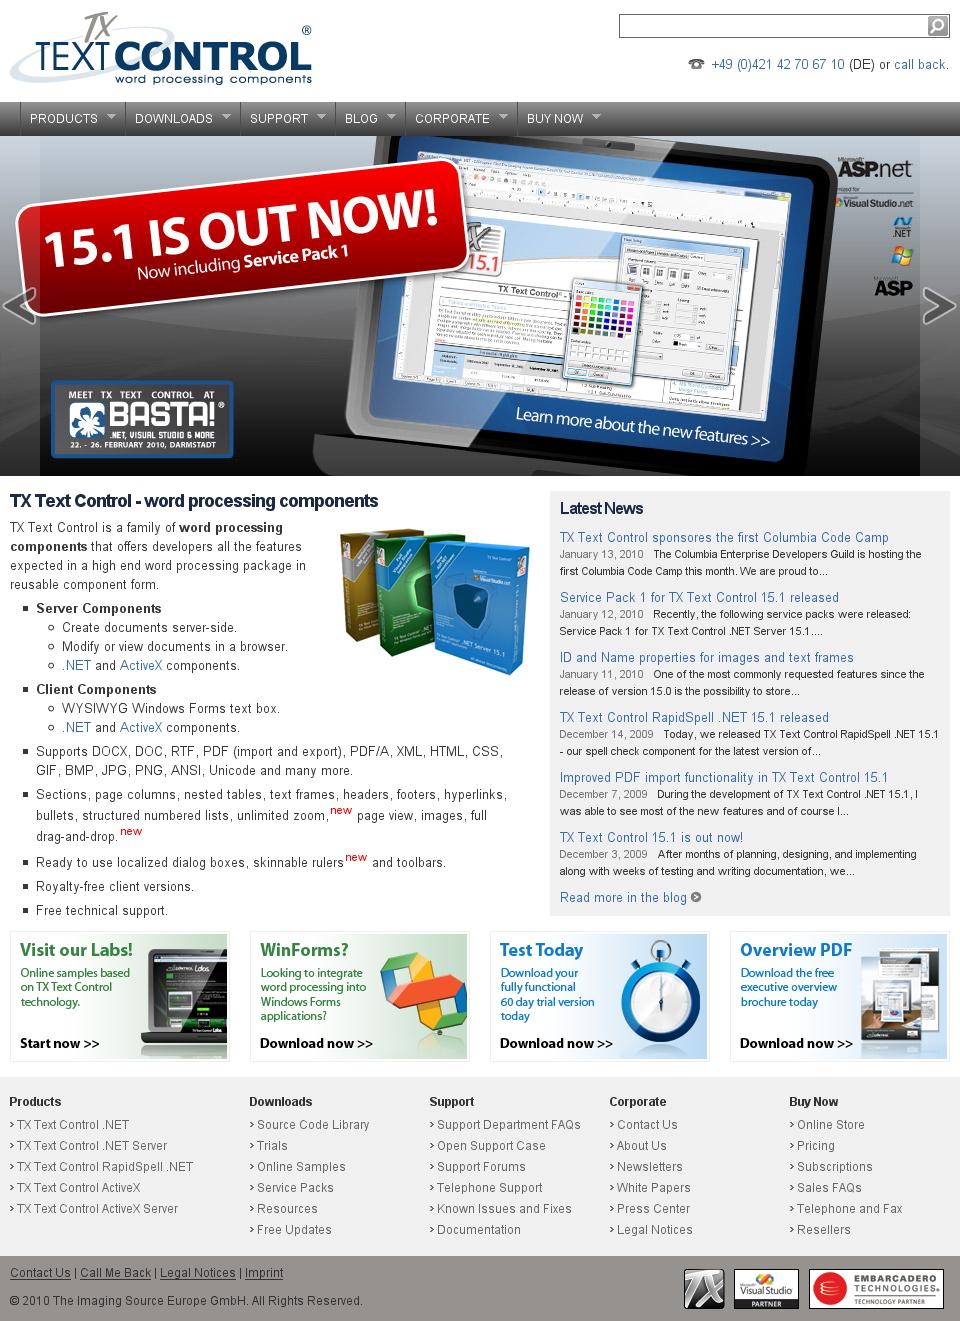 New TX Text Control Web Site